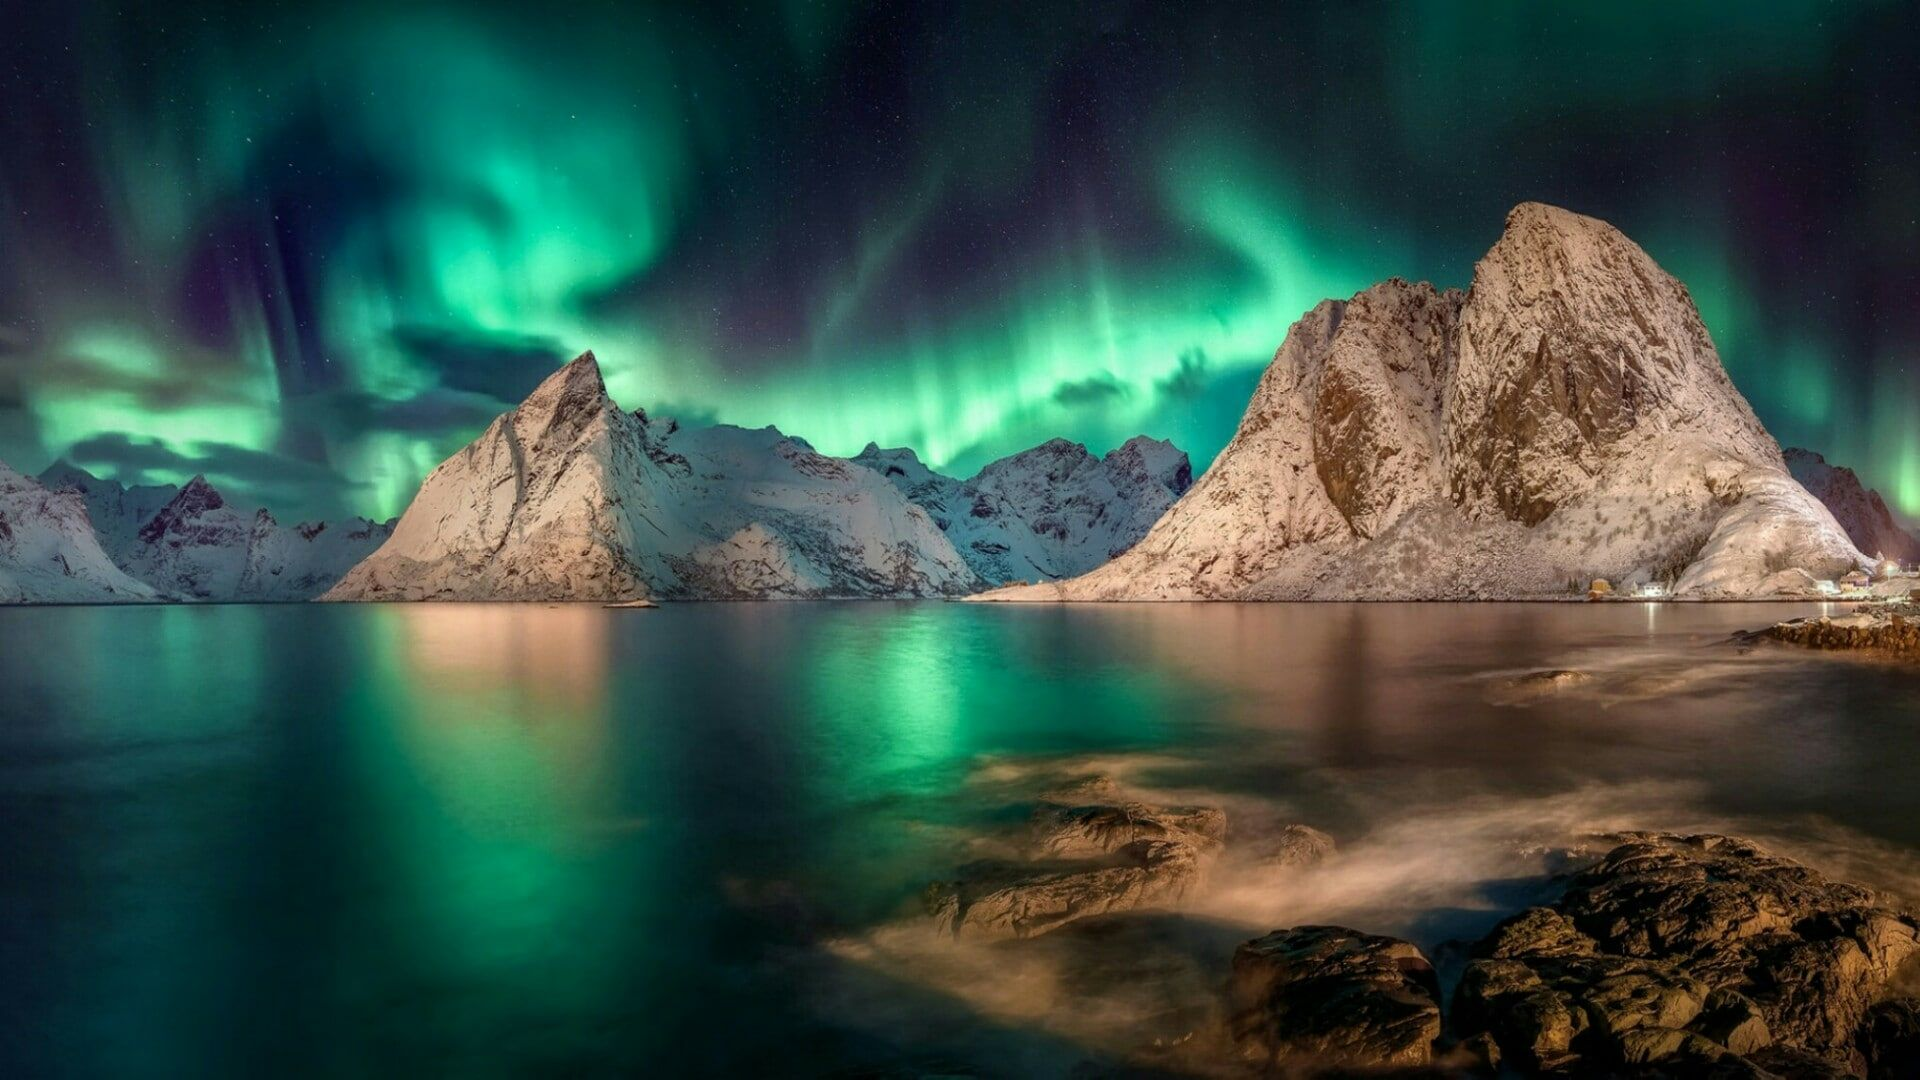 Landscape Polar Lights Aurora Borealis Reinefjord Norway Lofoten Hamnoy Rock Fjord Northern Lights Mountain Wat In 2020 Norway Landscape Polar Light Landscape